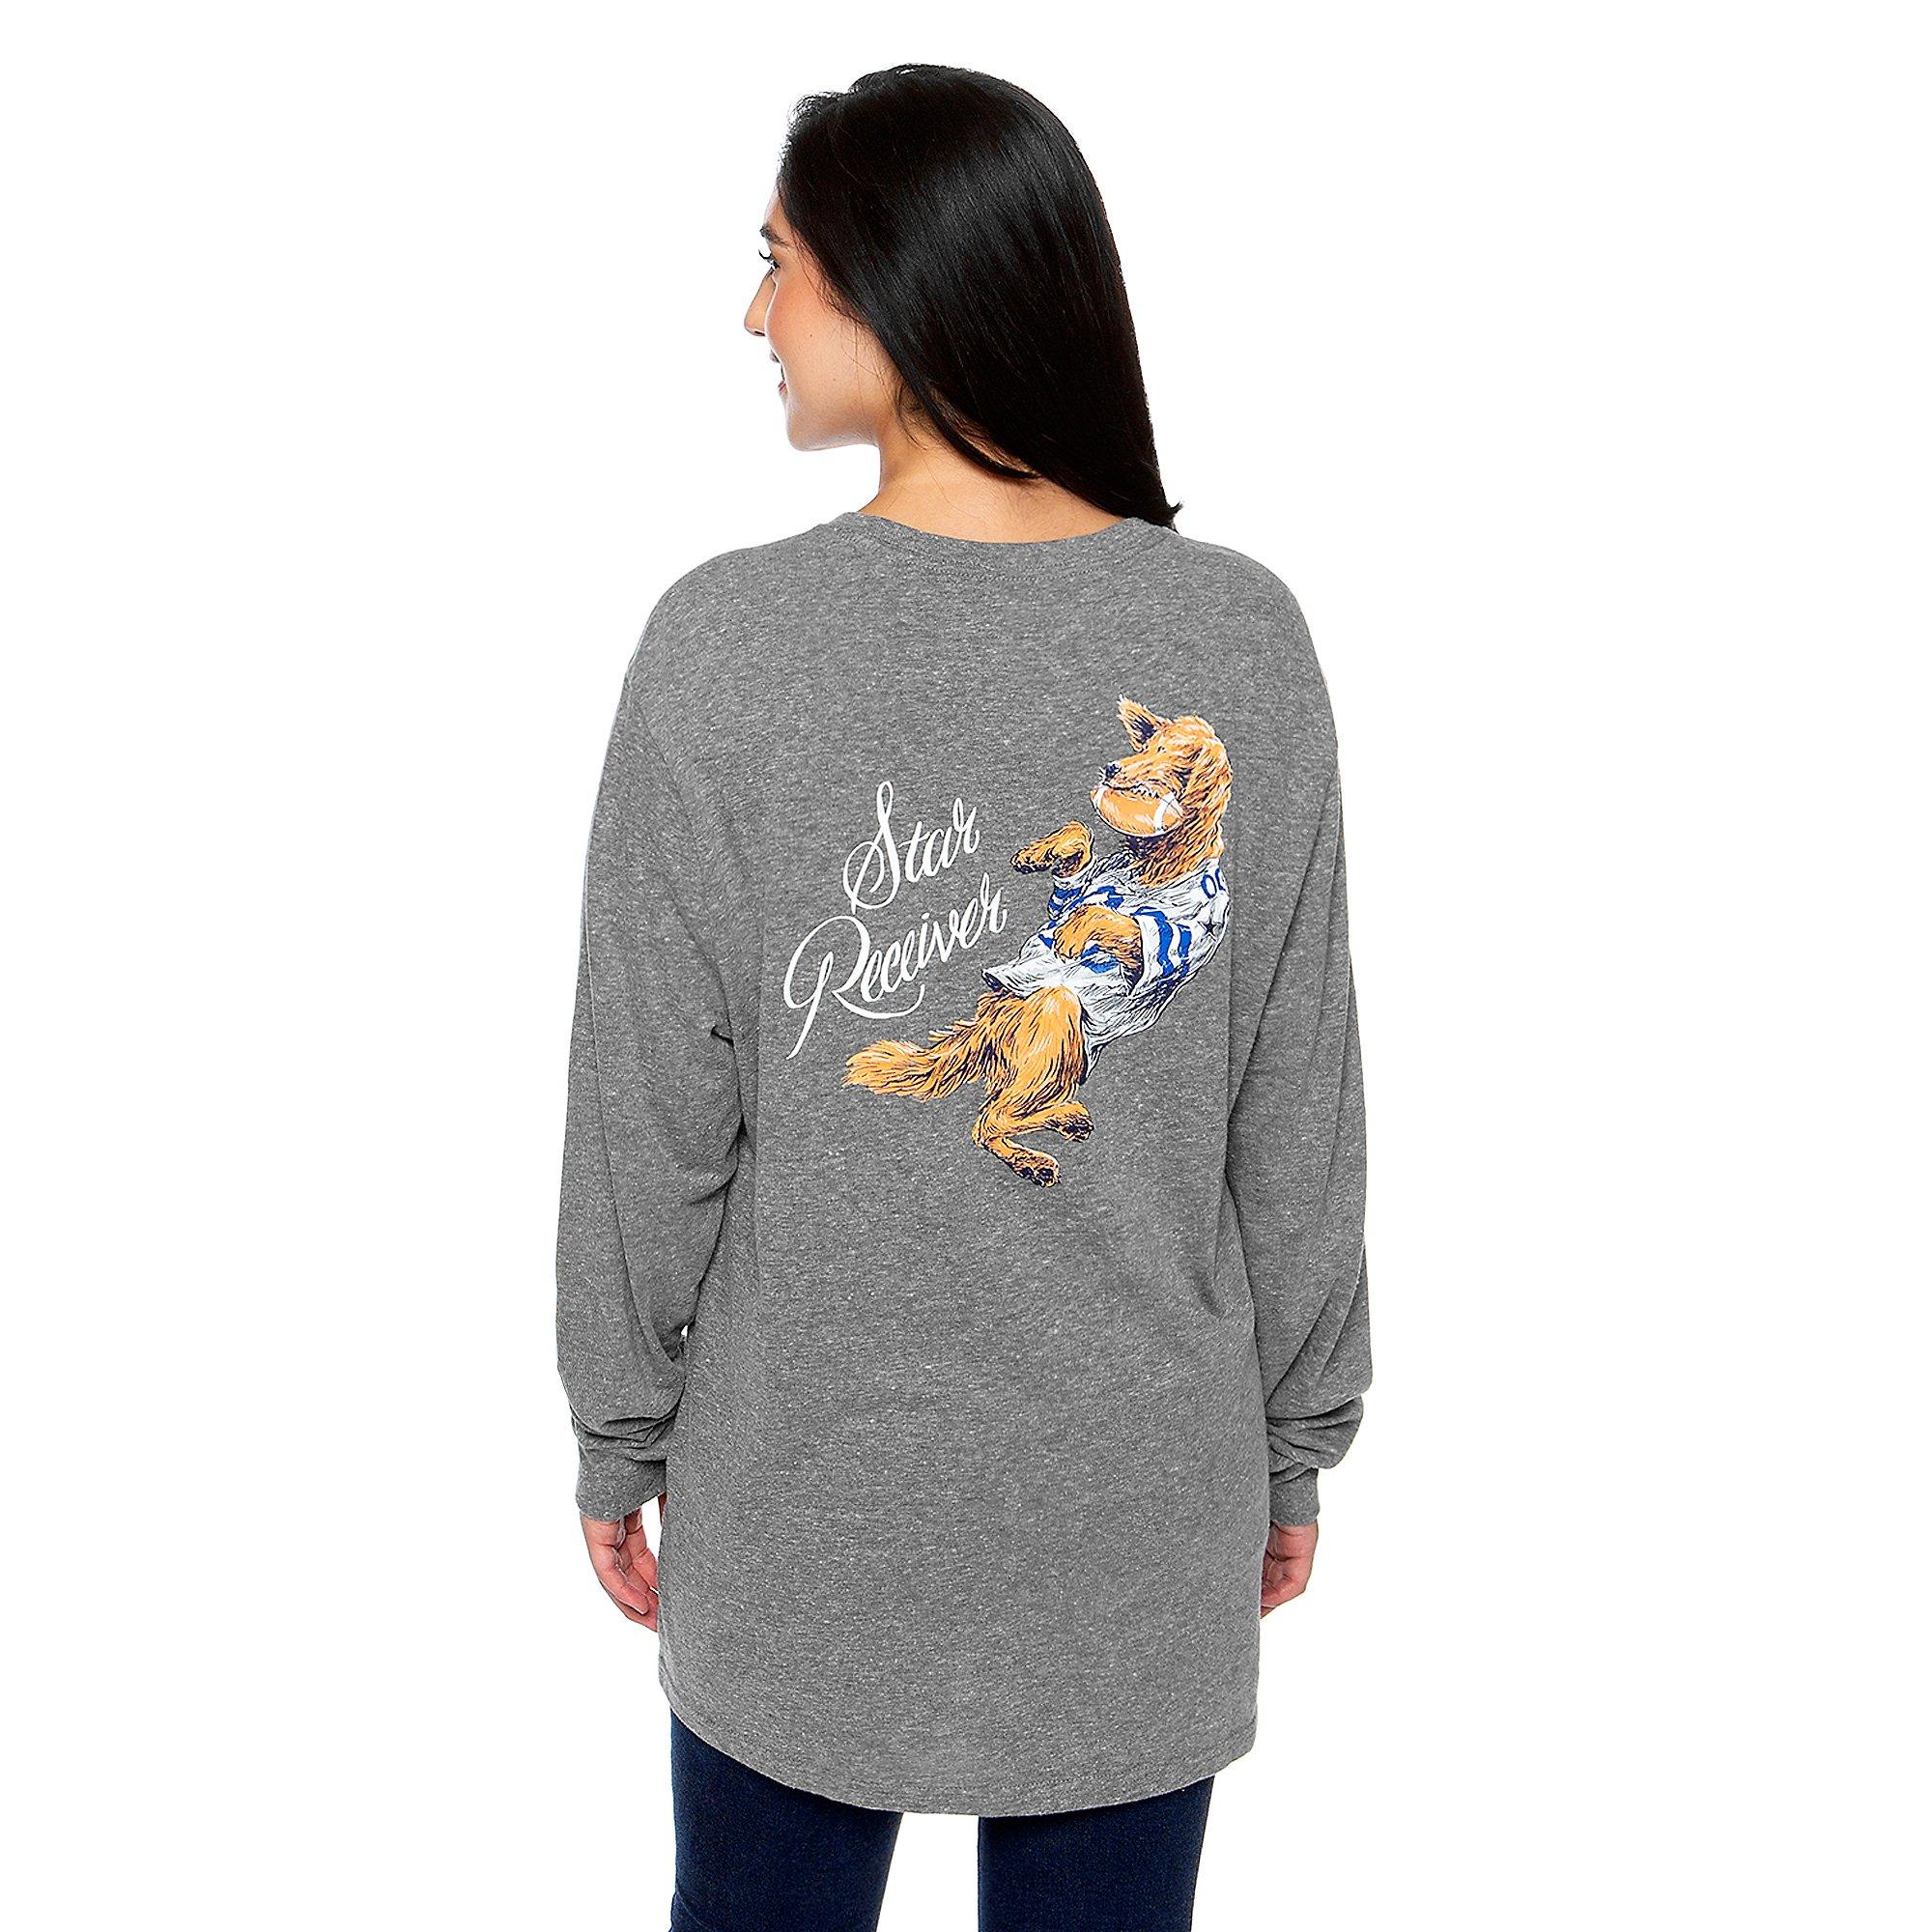 Dallas Cowboys Team LJ Womens Born Star Receiver T-Shirt